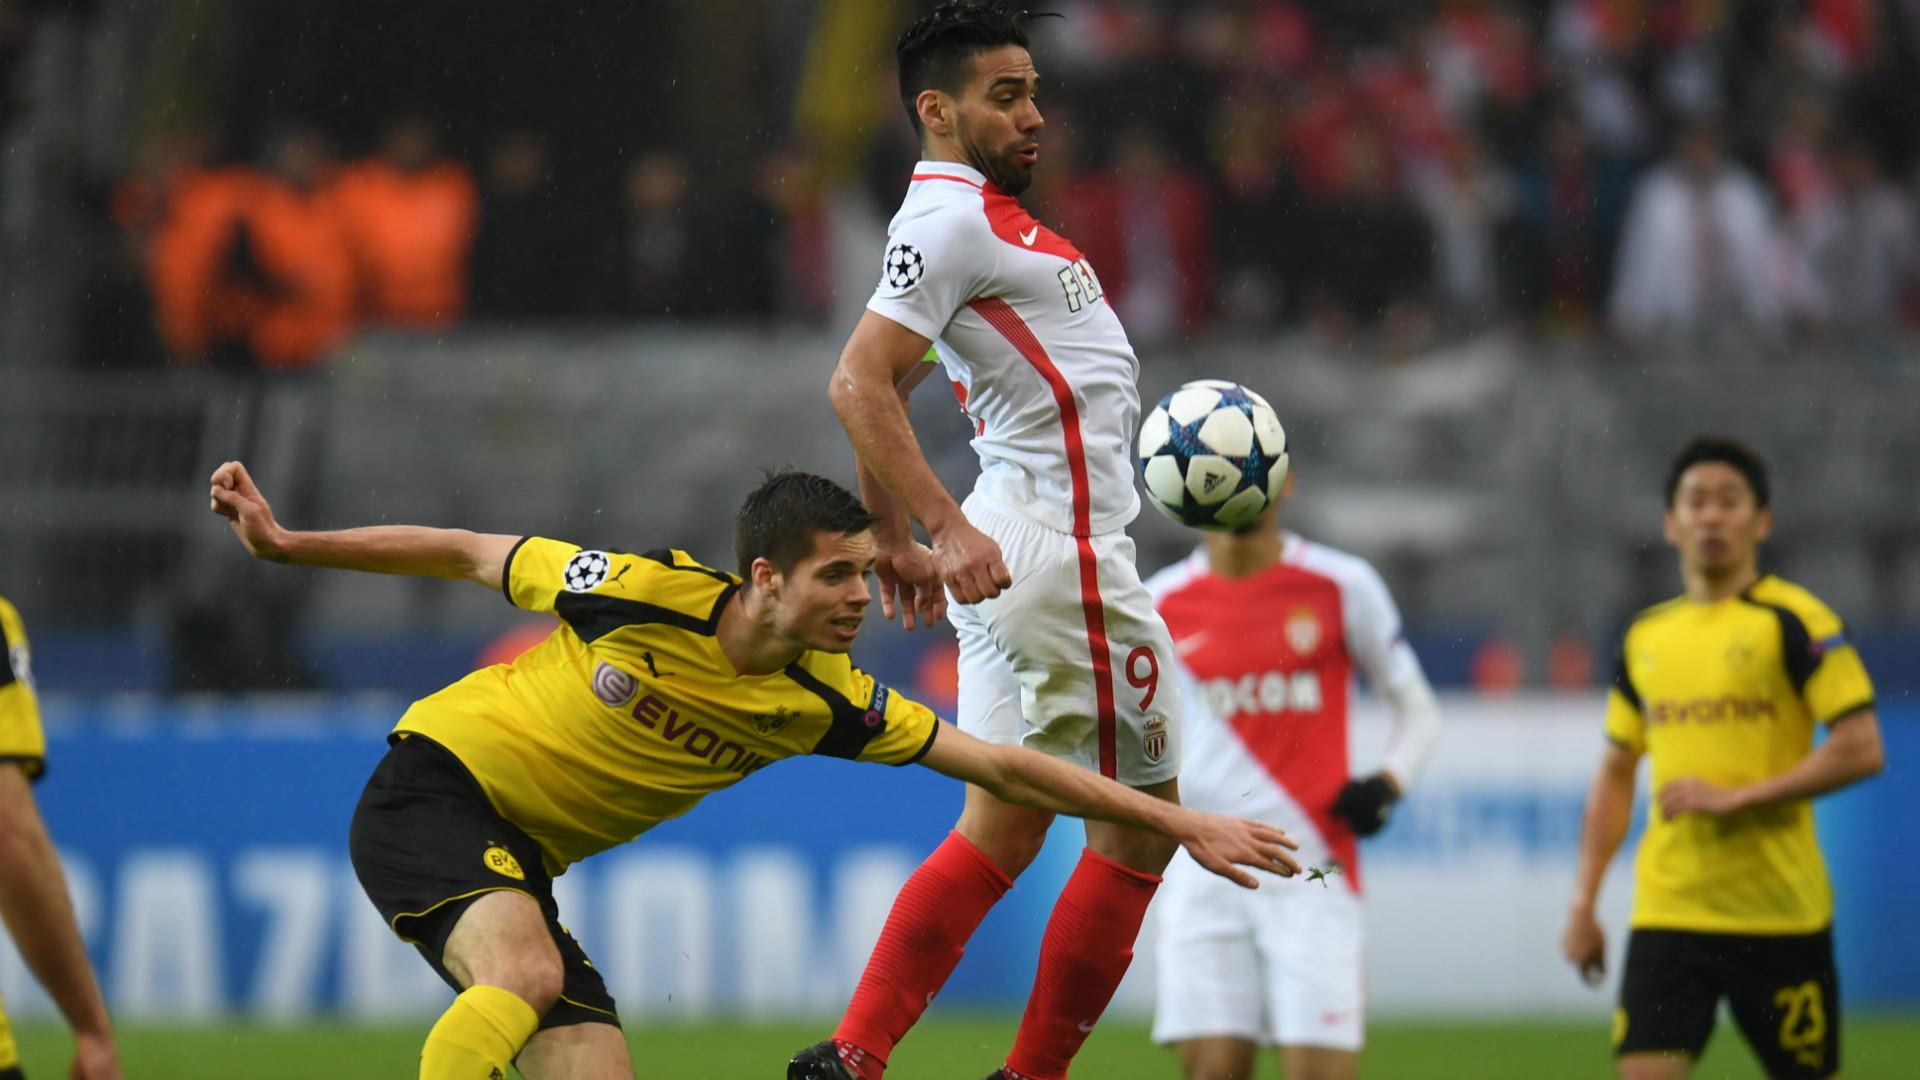 Radamel Falcao Monaco Borussia Dortmund 12042017